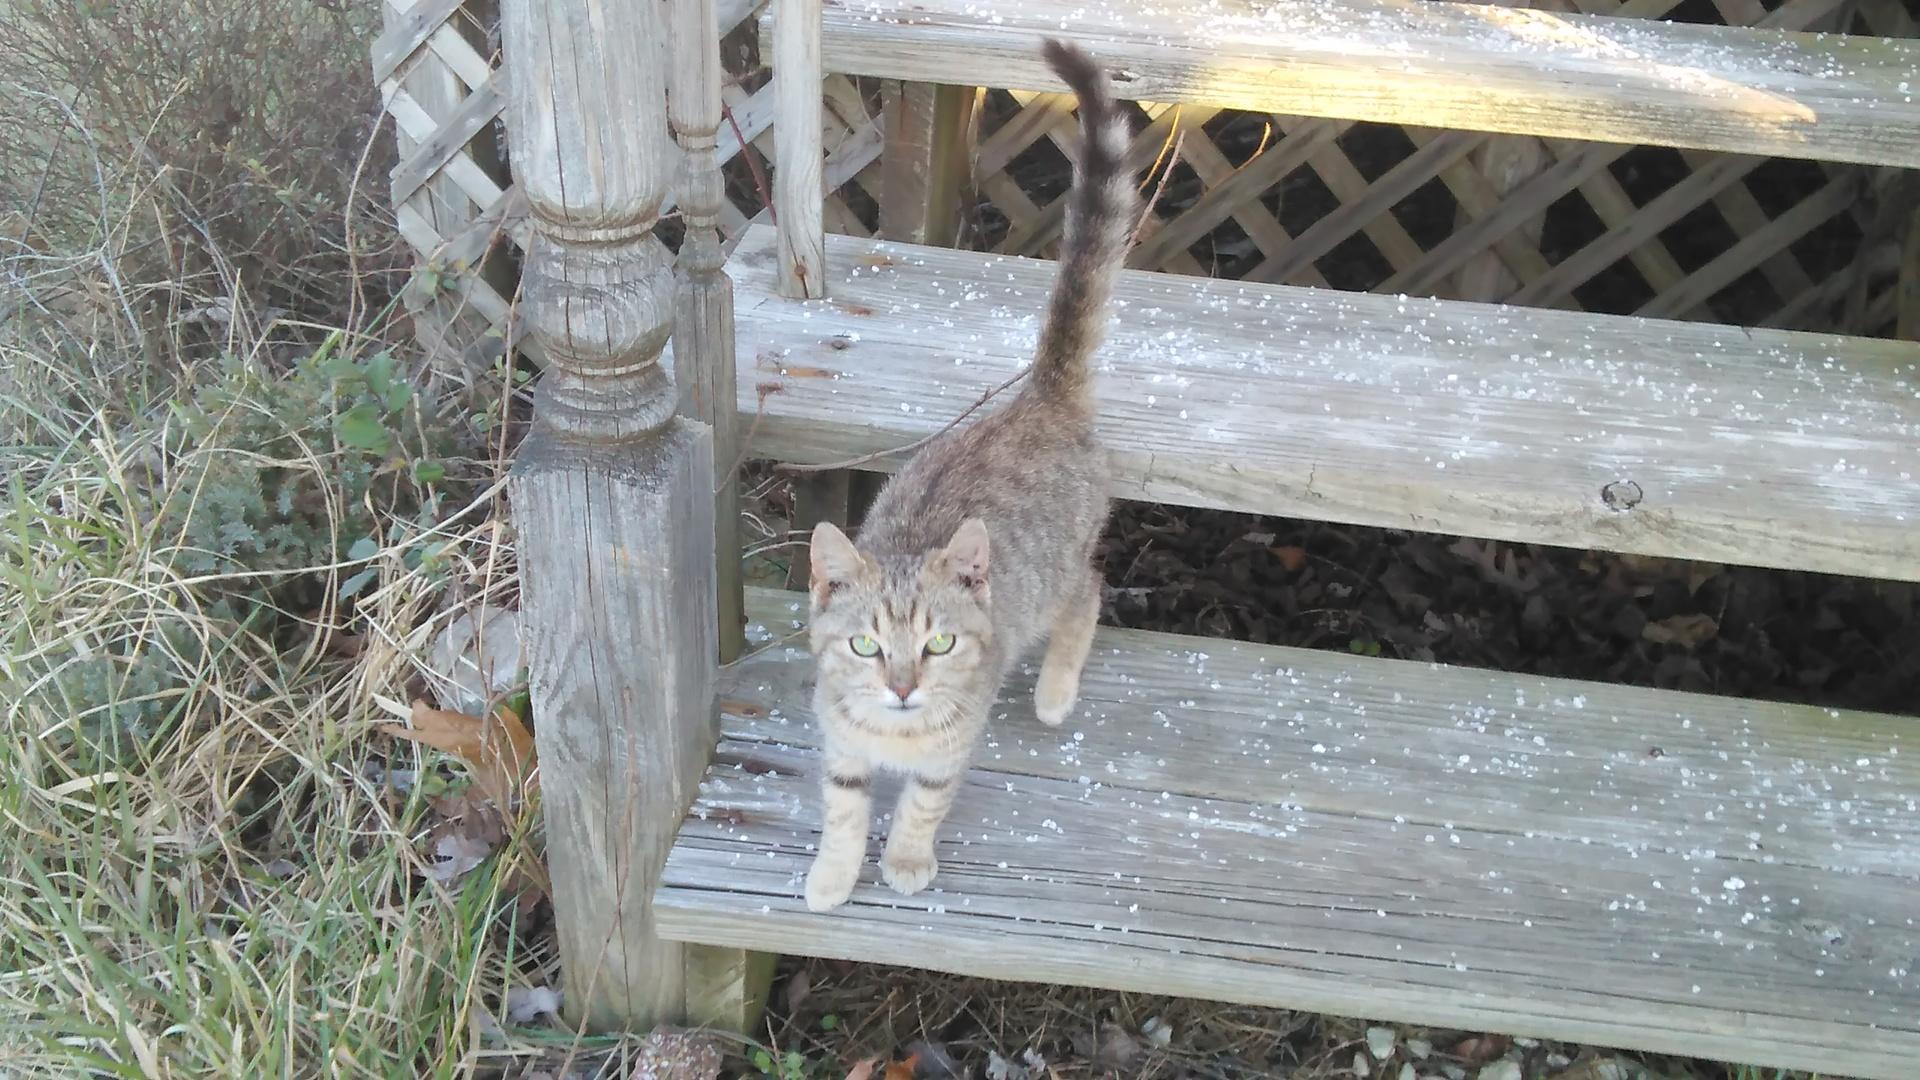 Young stray cat   codenamesailorearth, animal, cute, mammal